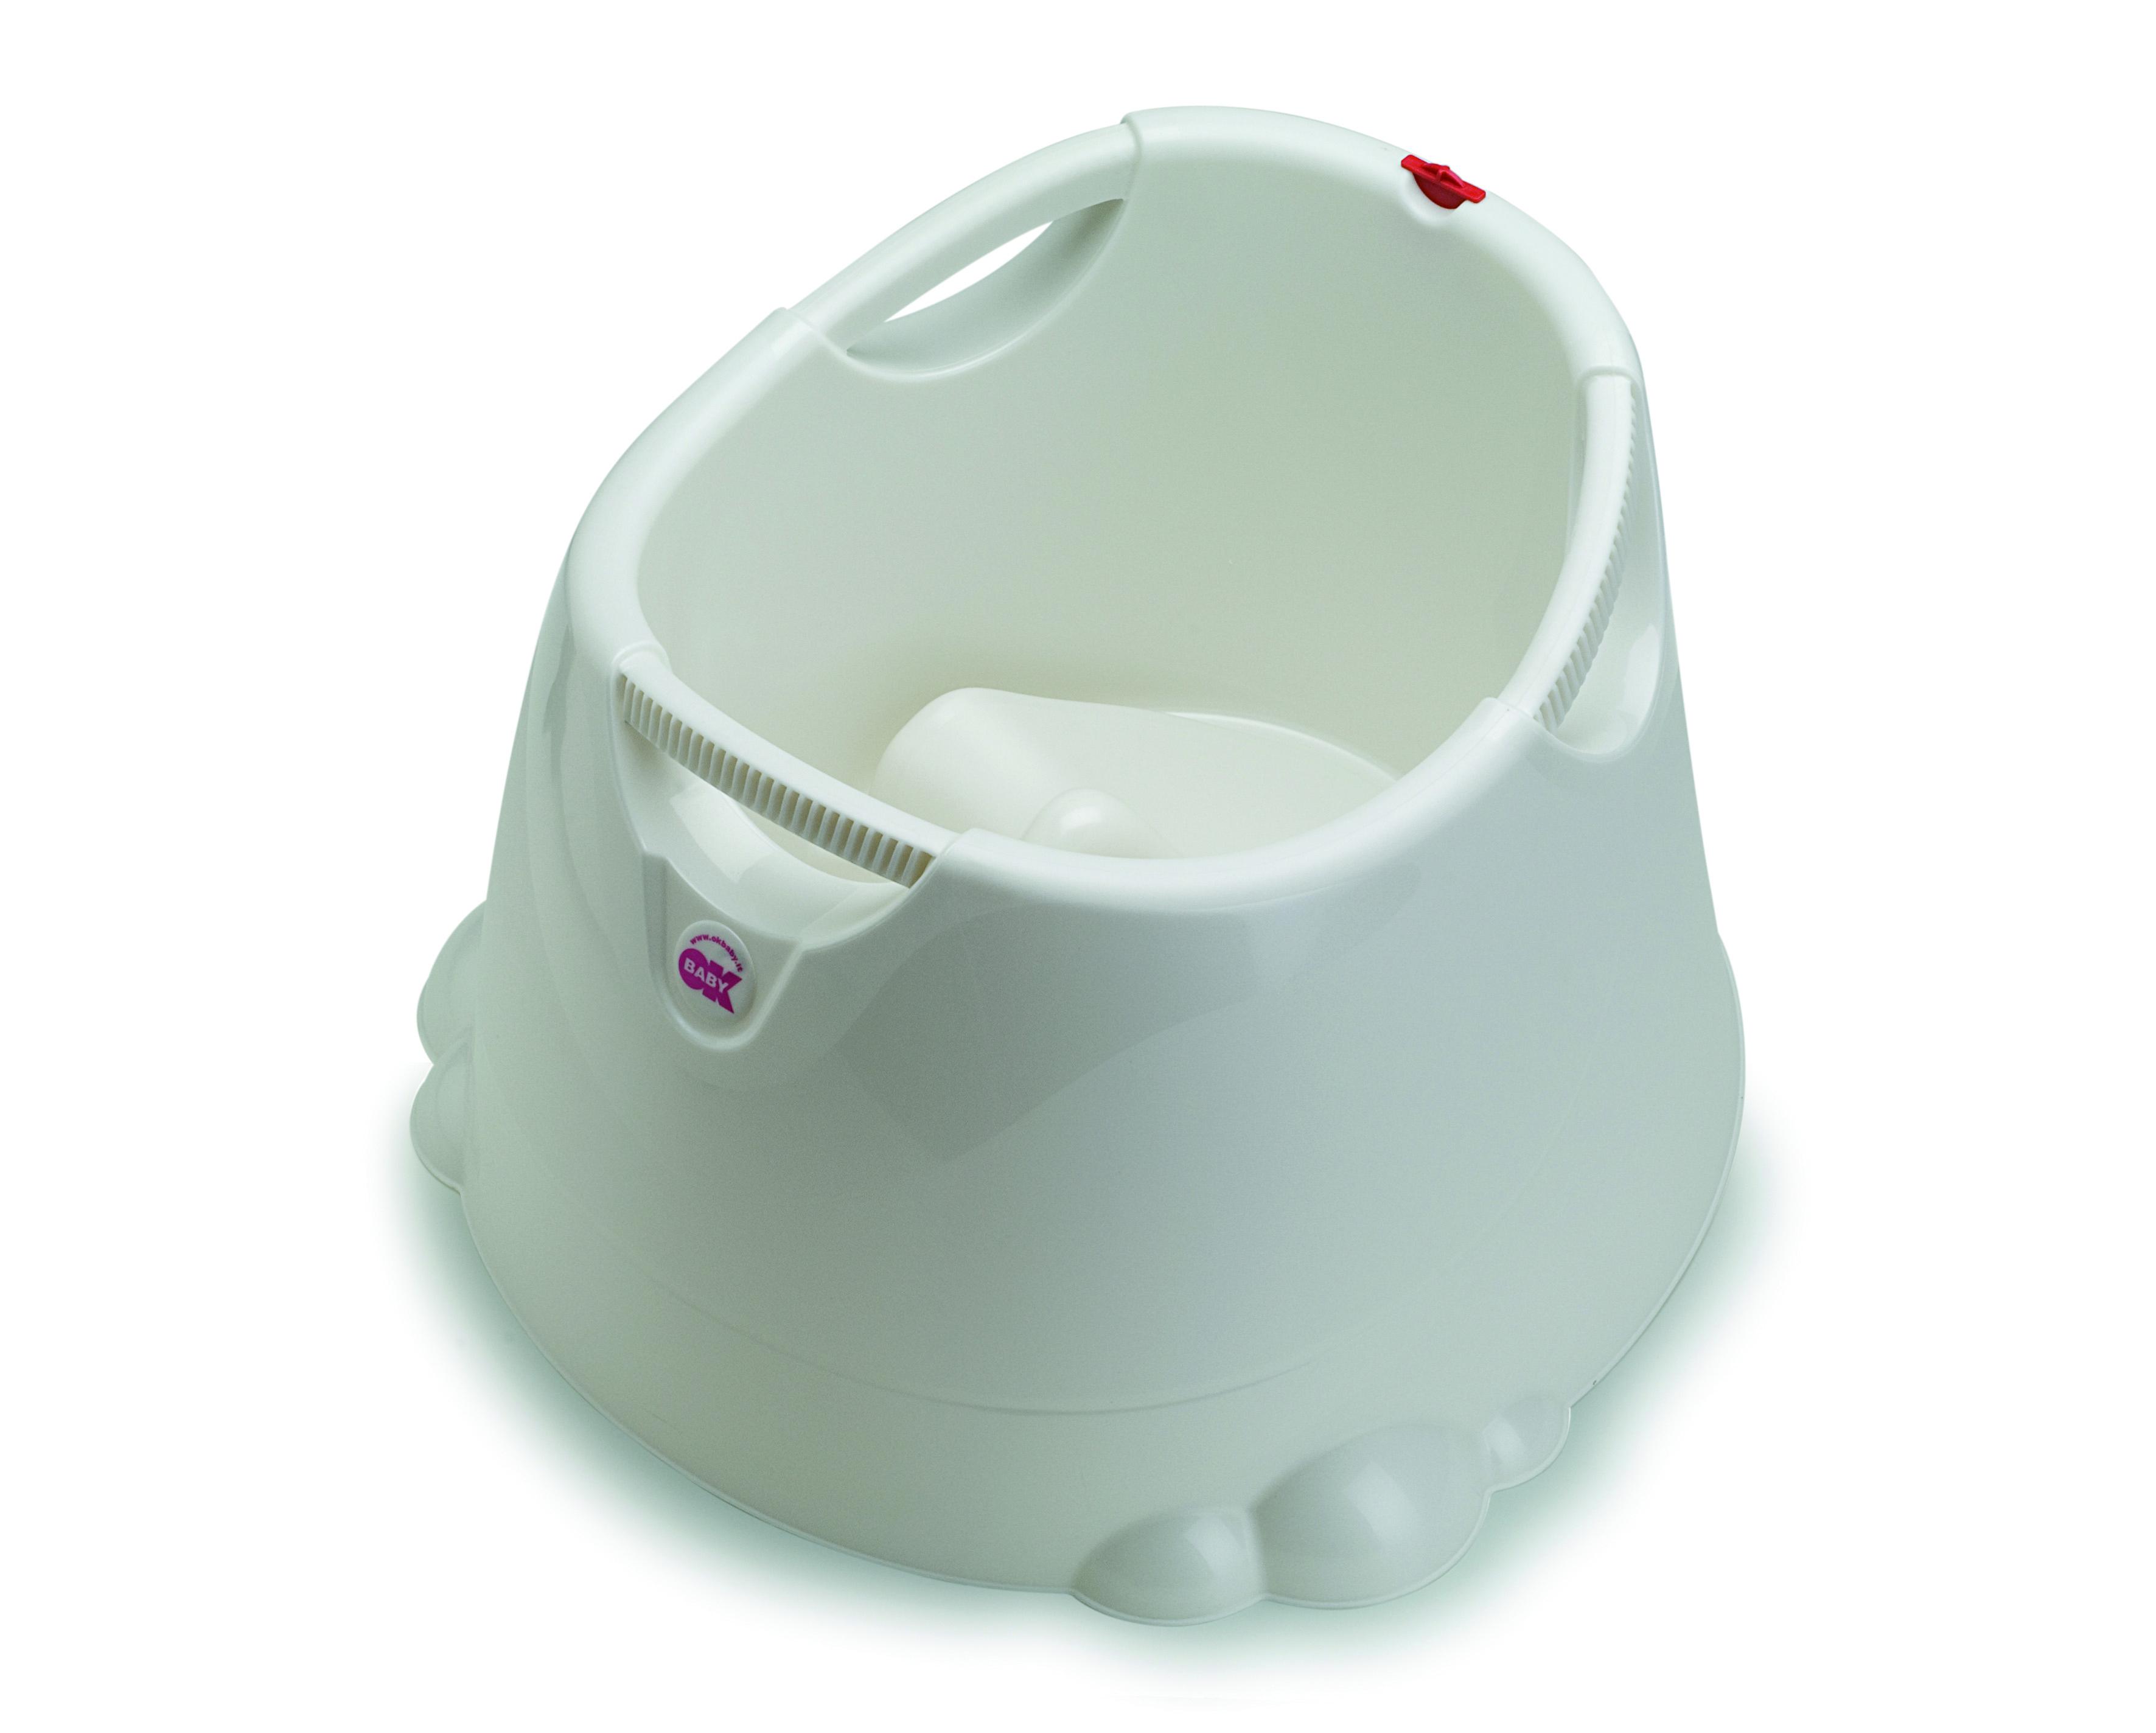 Pavimento cemento idee - Vaschetta bagno bimbo ...